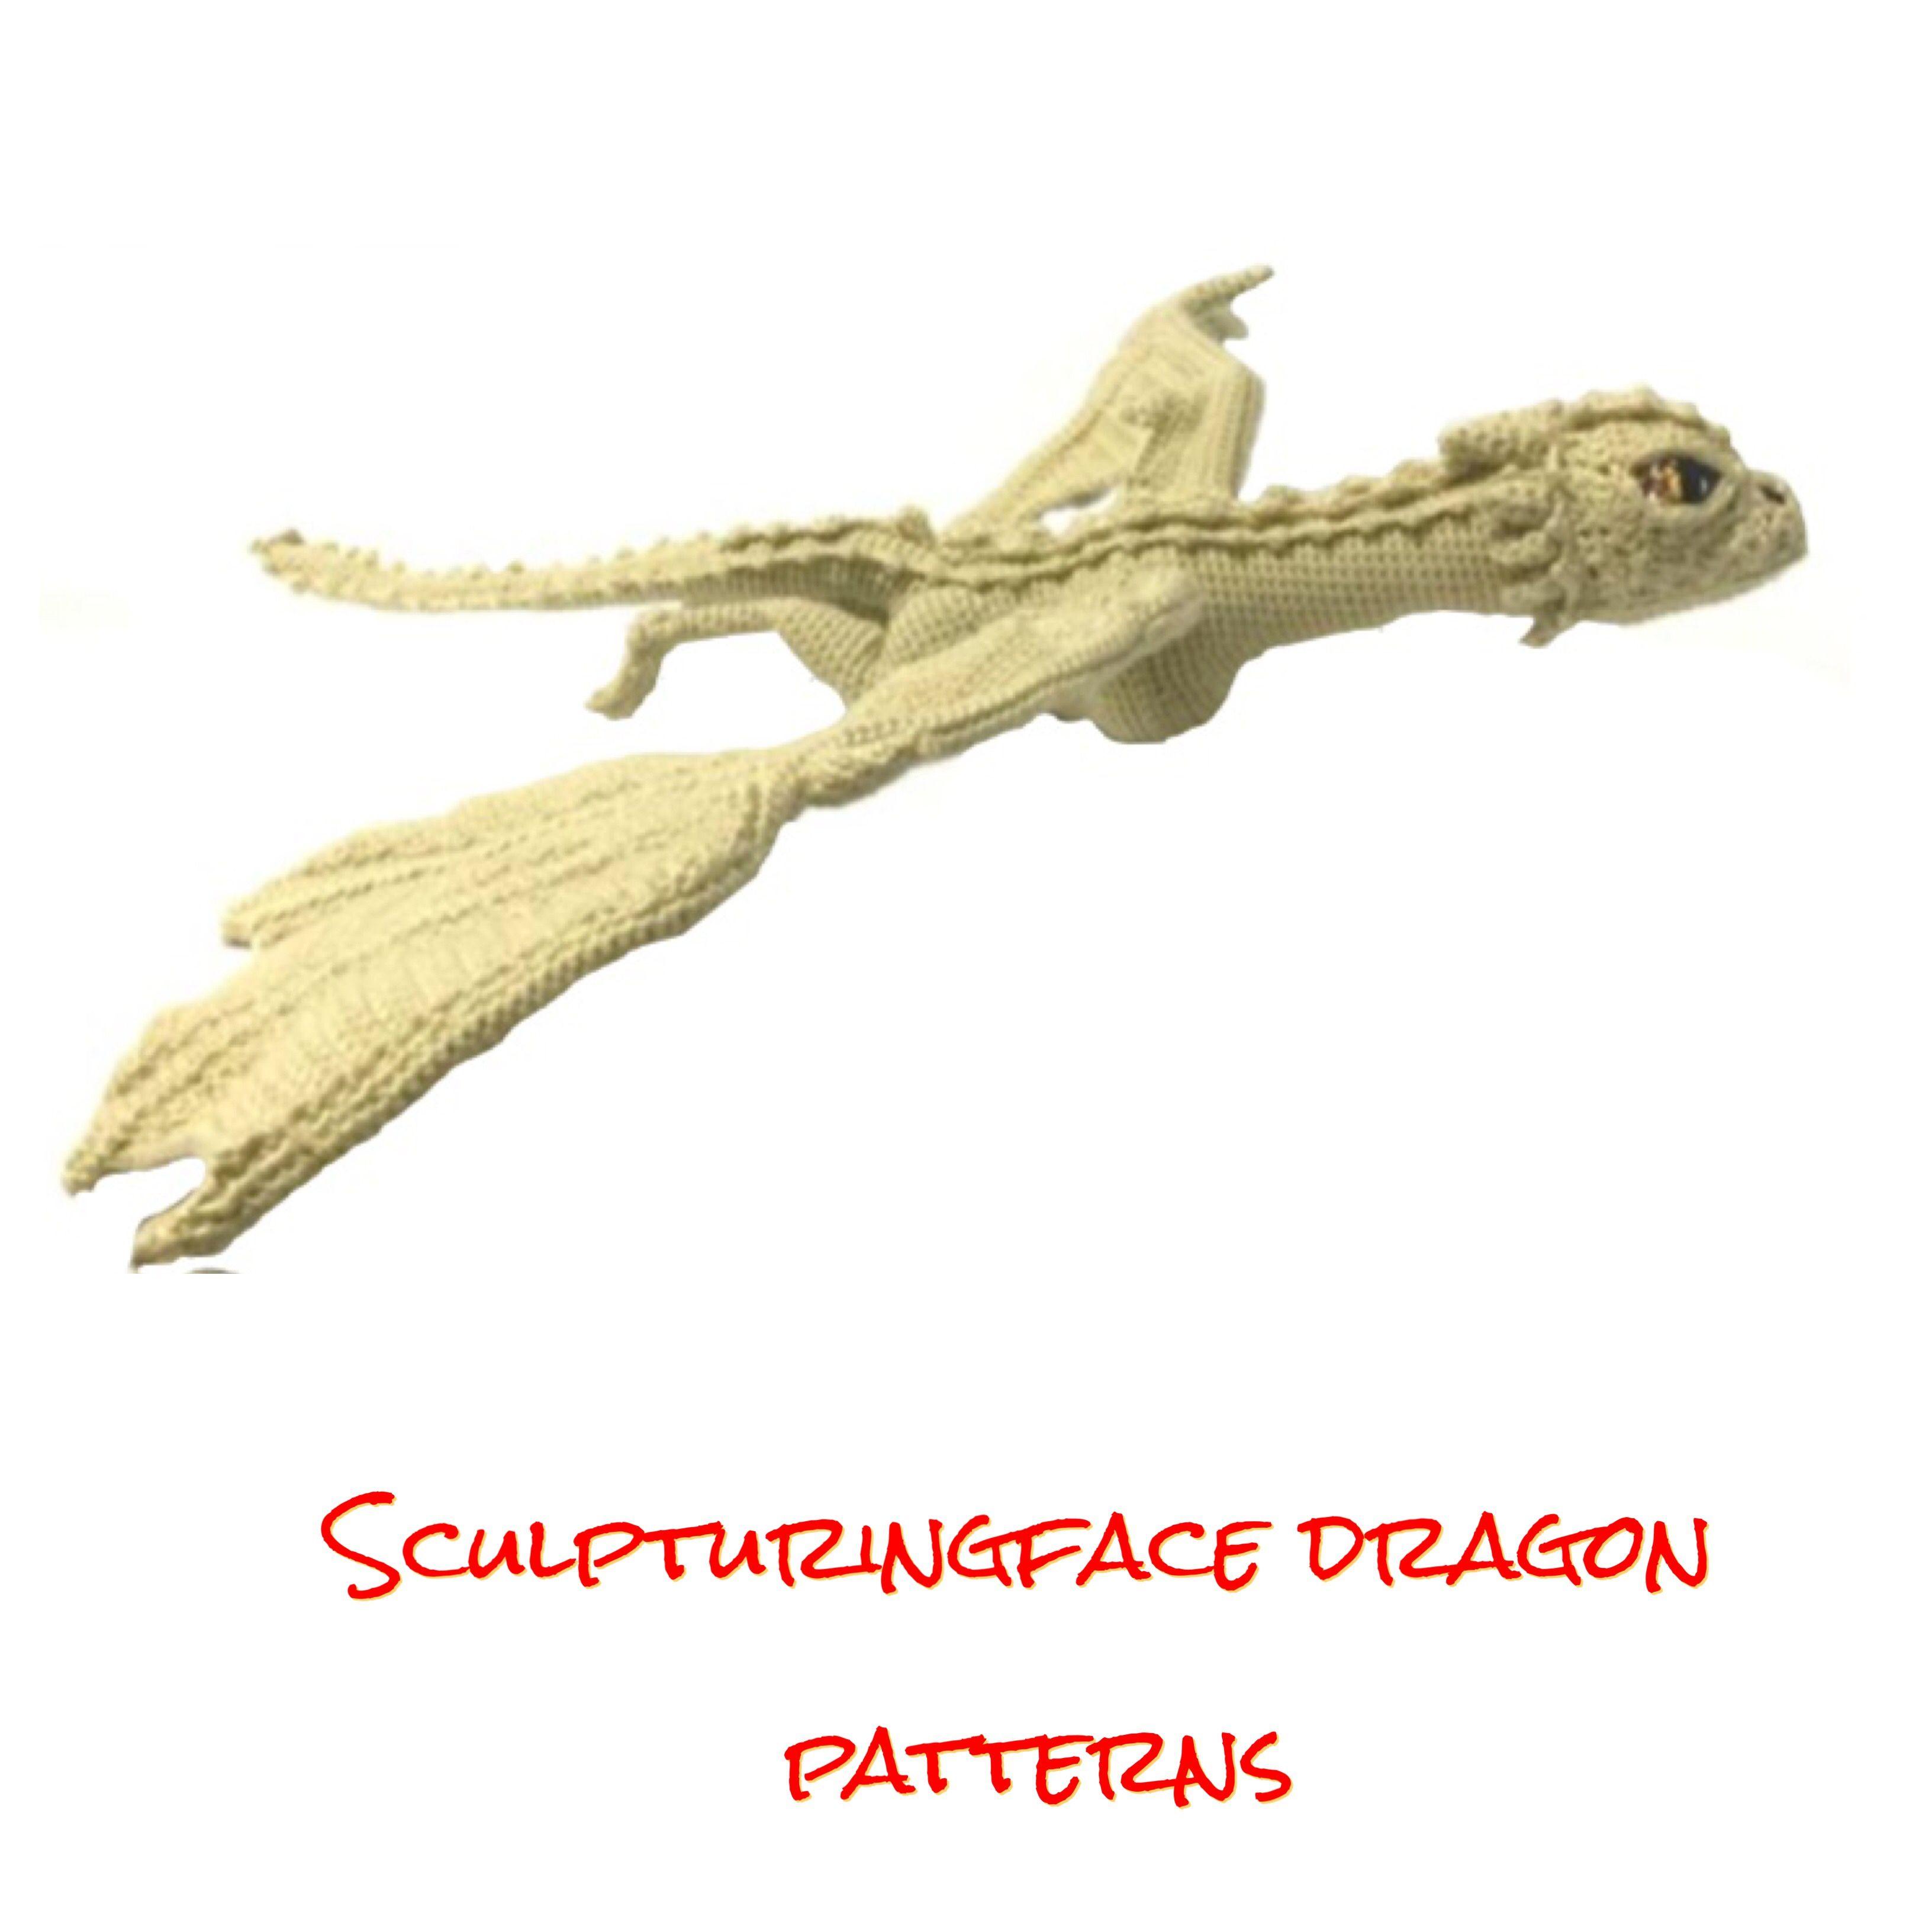 Dragon amigurumi crochet patterns by Sculpturingface | Amigurumi or ...